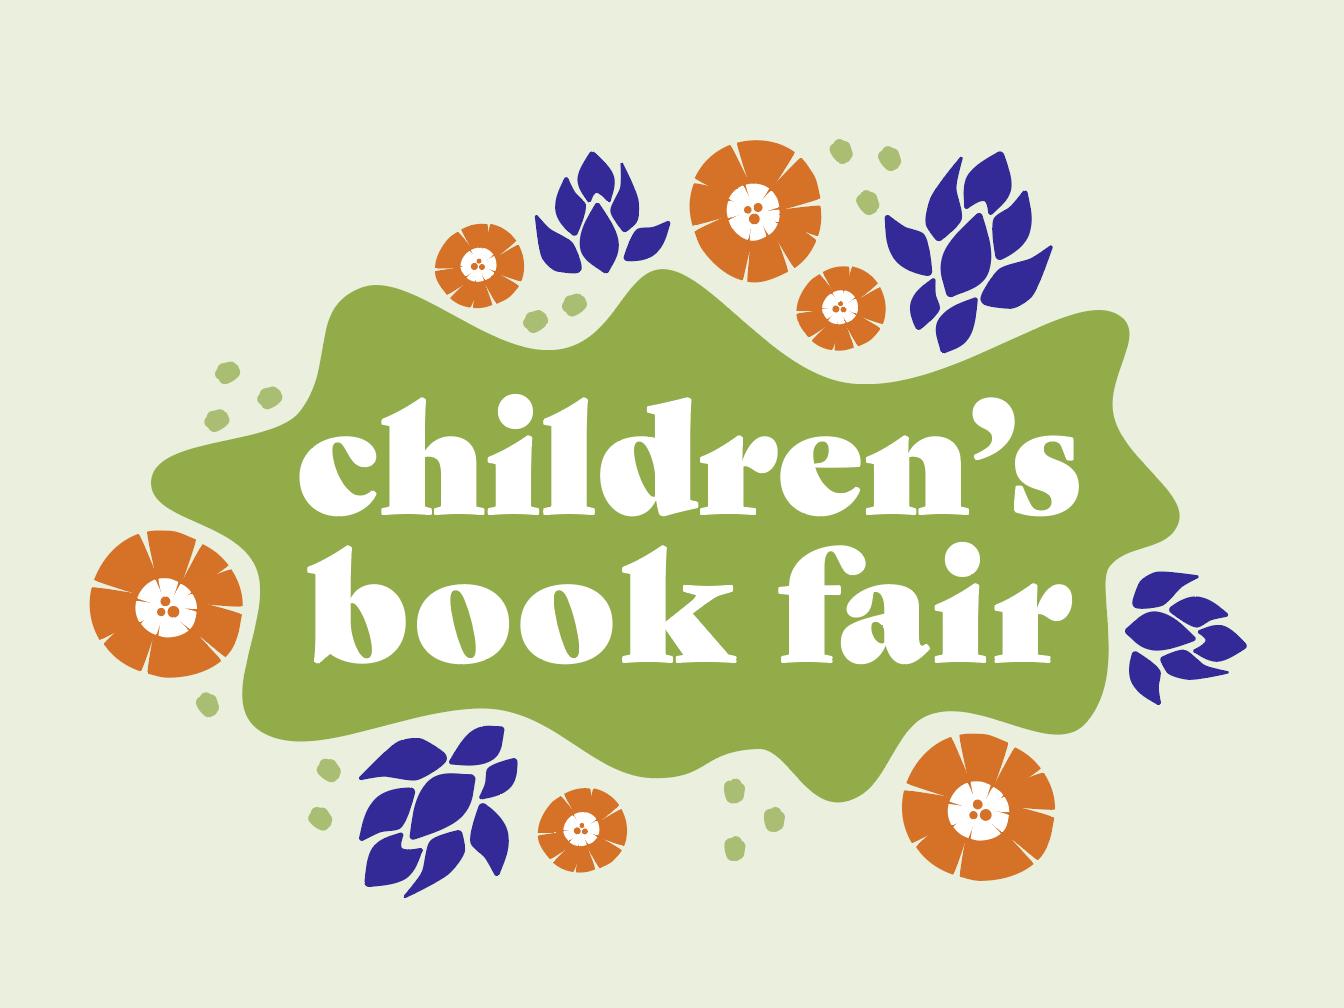 Children's book fair typography digital branding logo vector drawing illustration floral